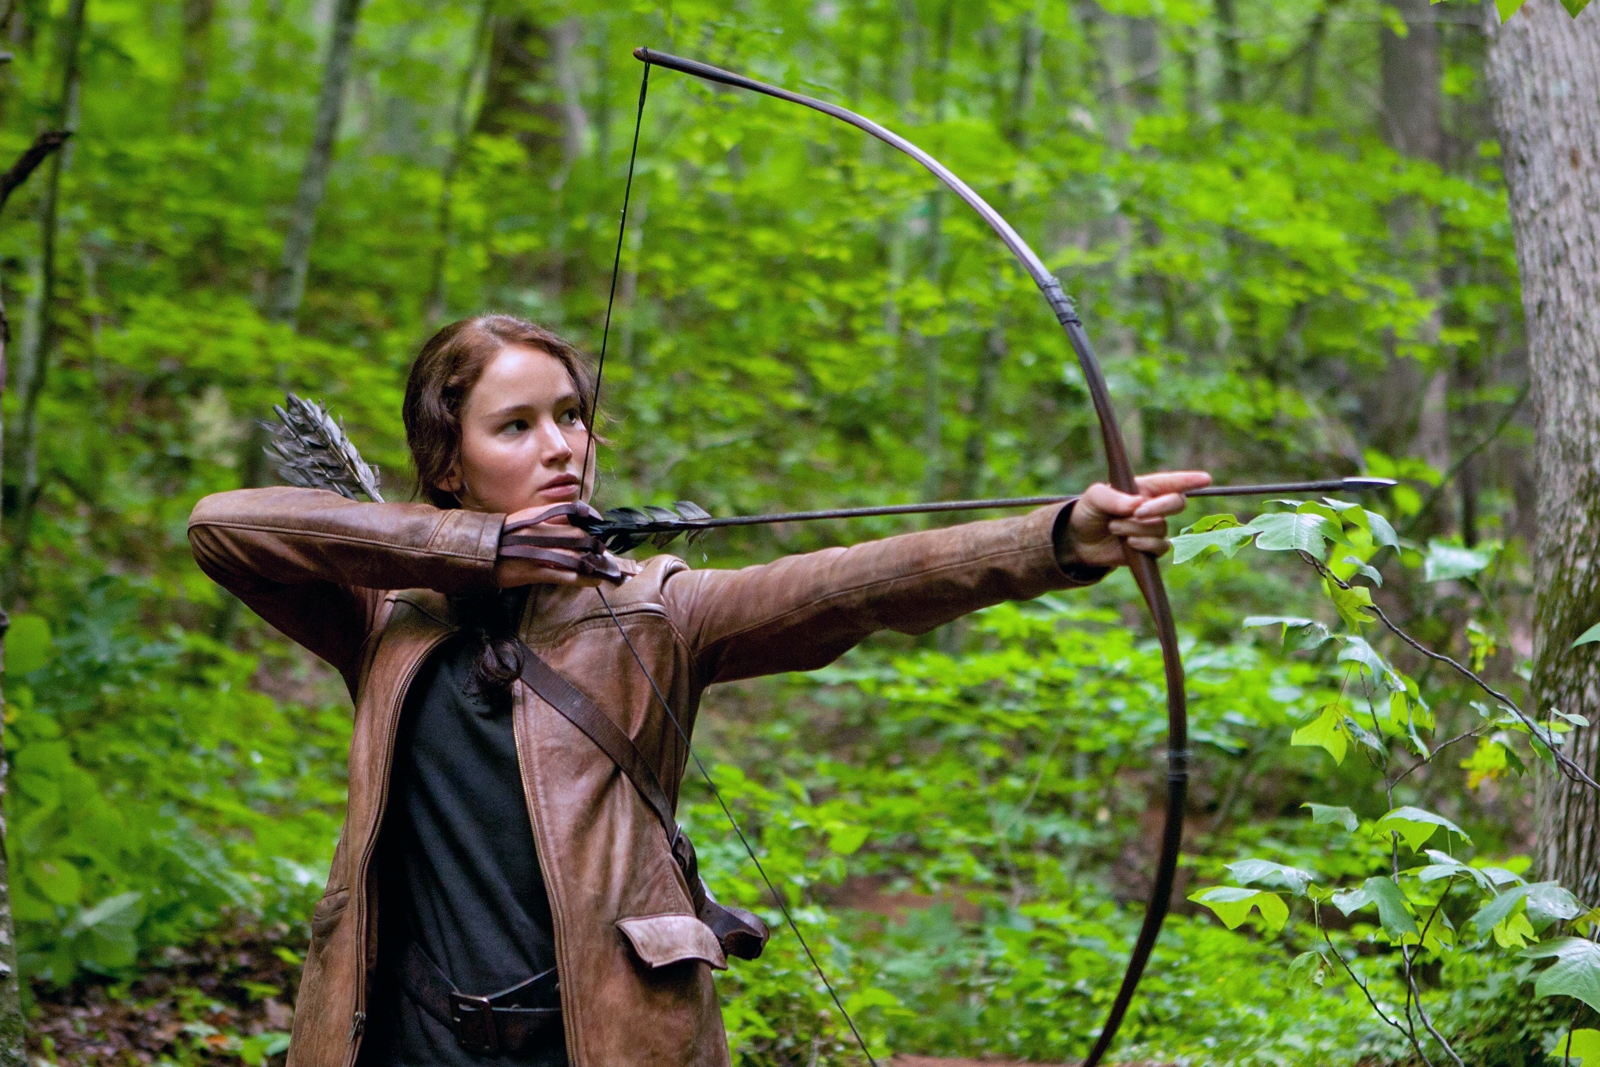 the story behind katniss hunting jacket from the hunger games the story behind katniss hunting jacket from the hunger games costume designer judianna makovsky